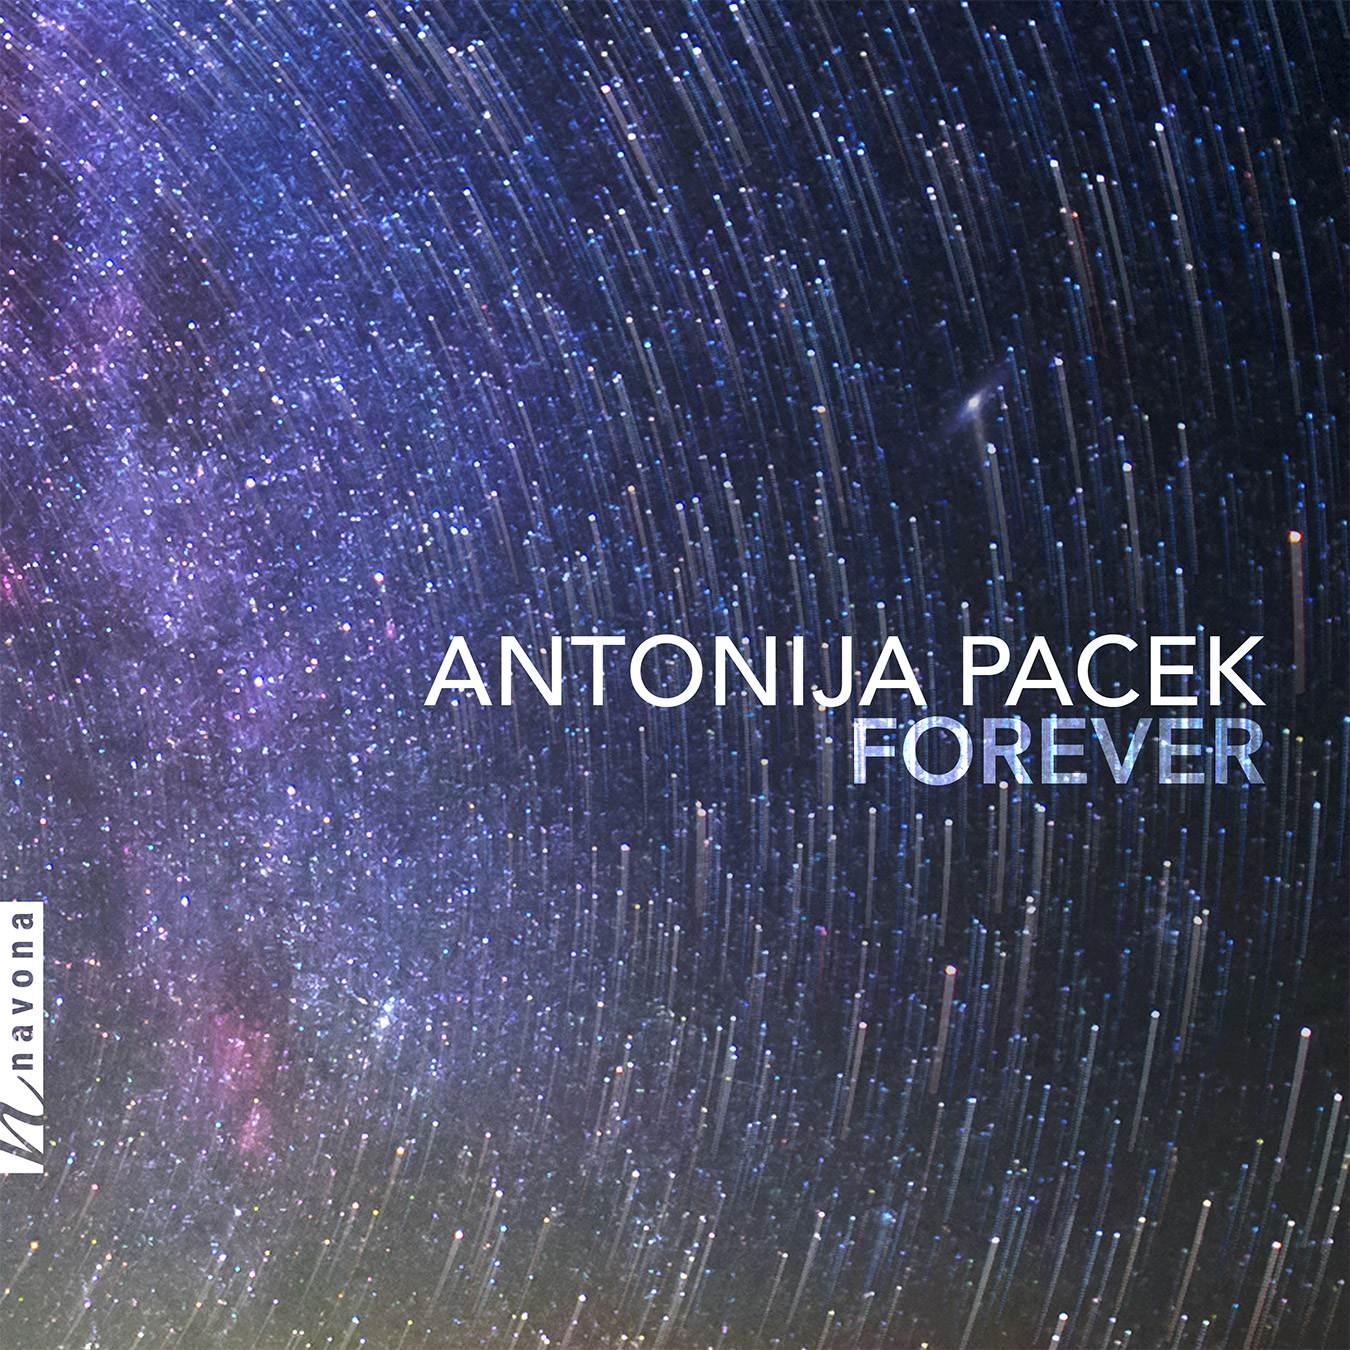 FOREVER - Album Cover